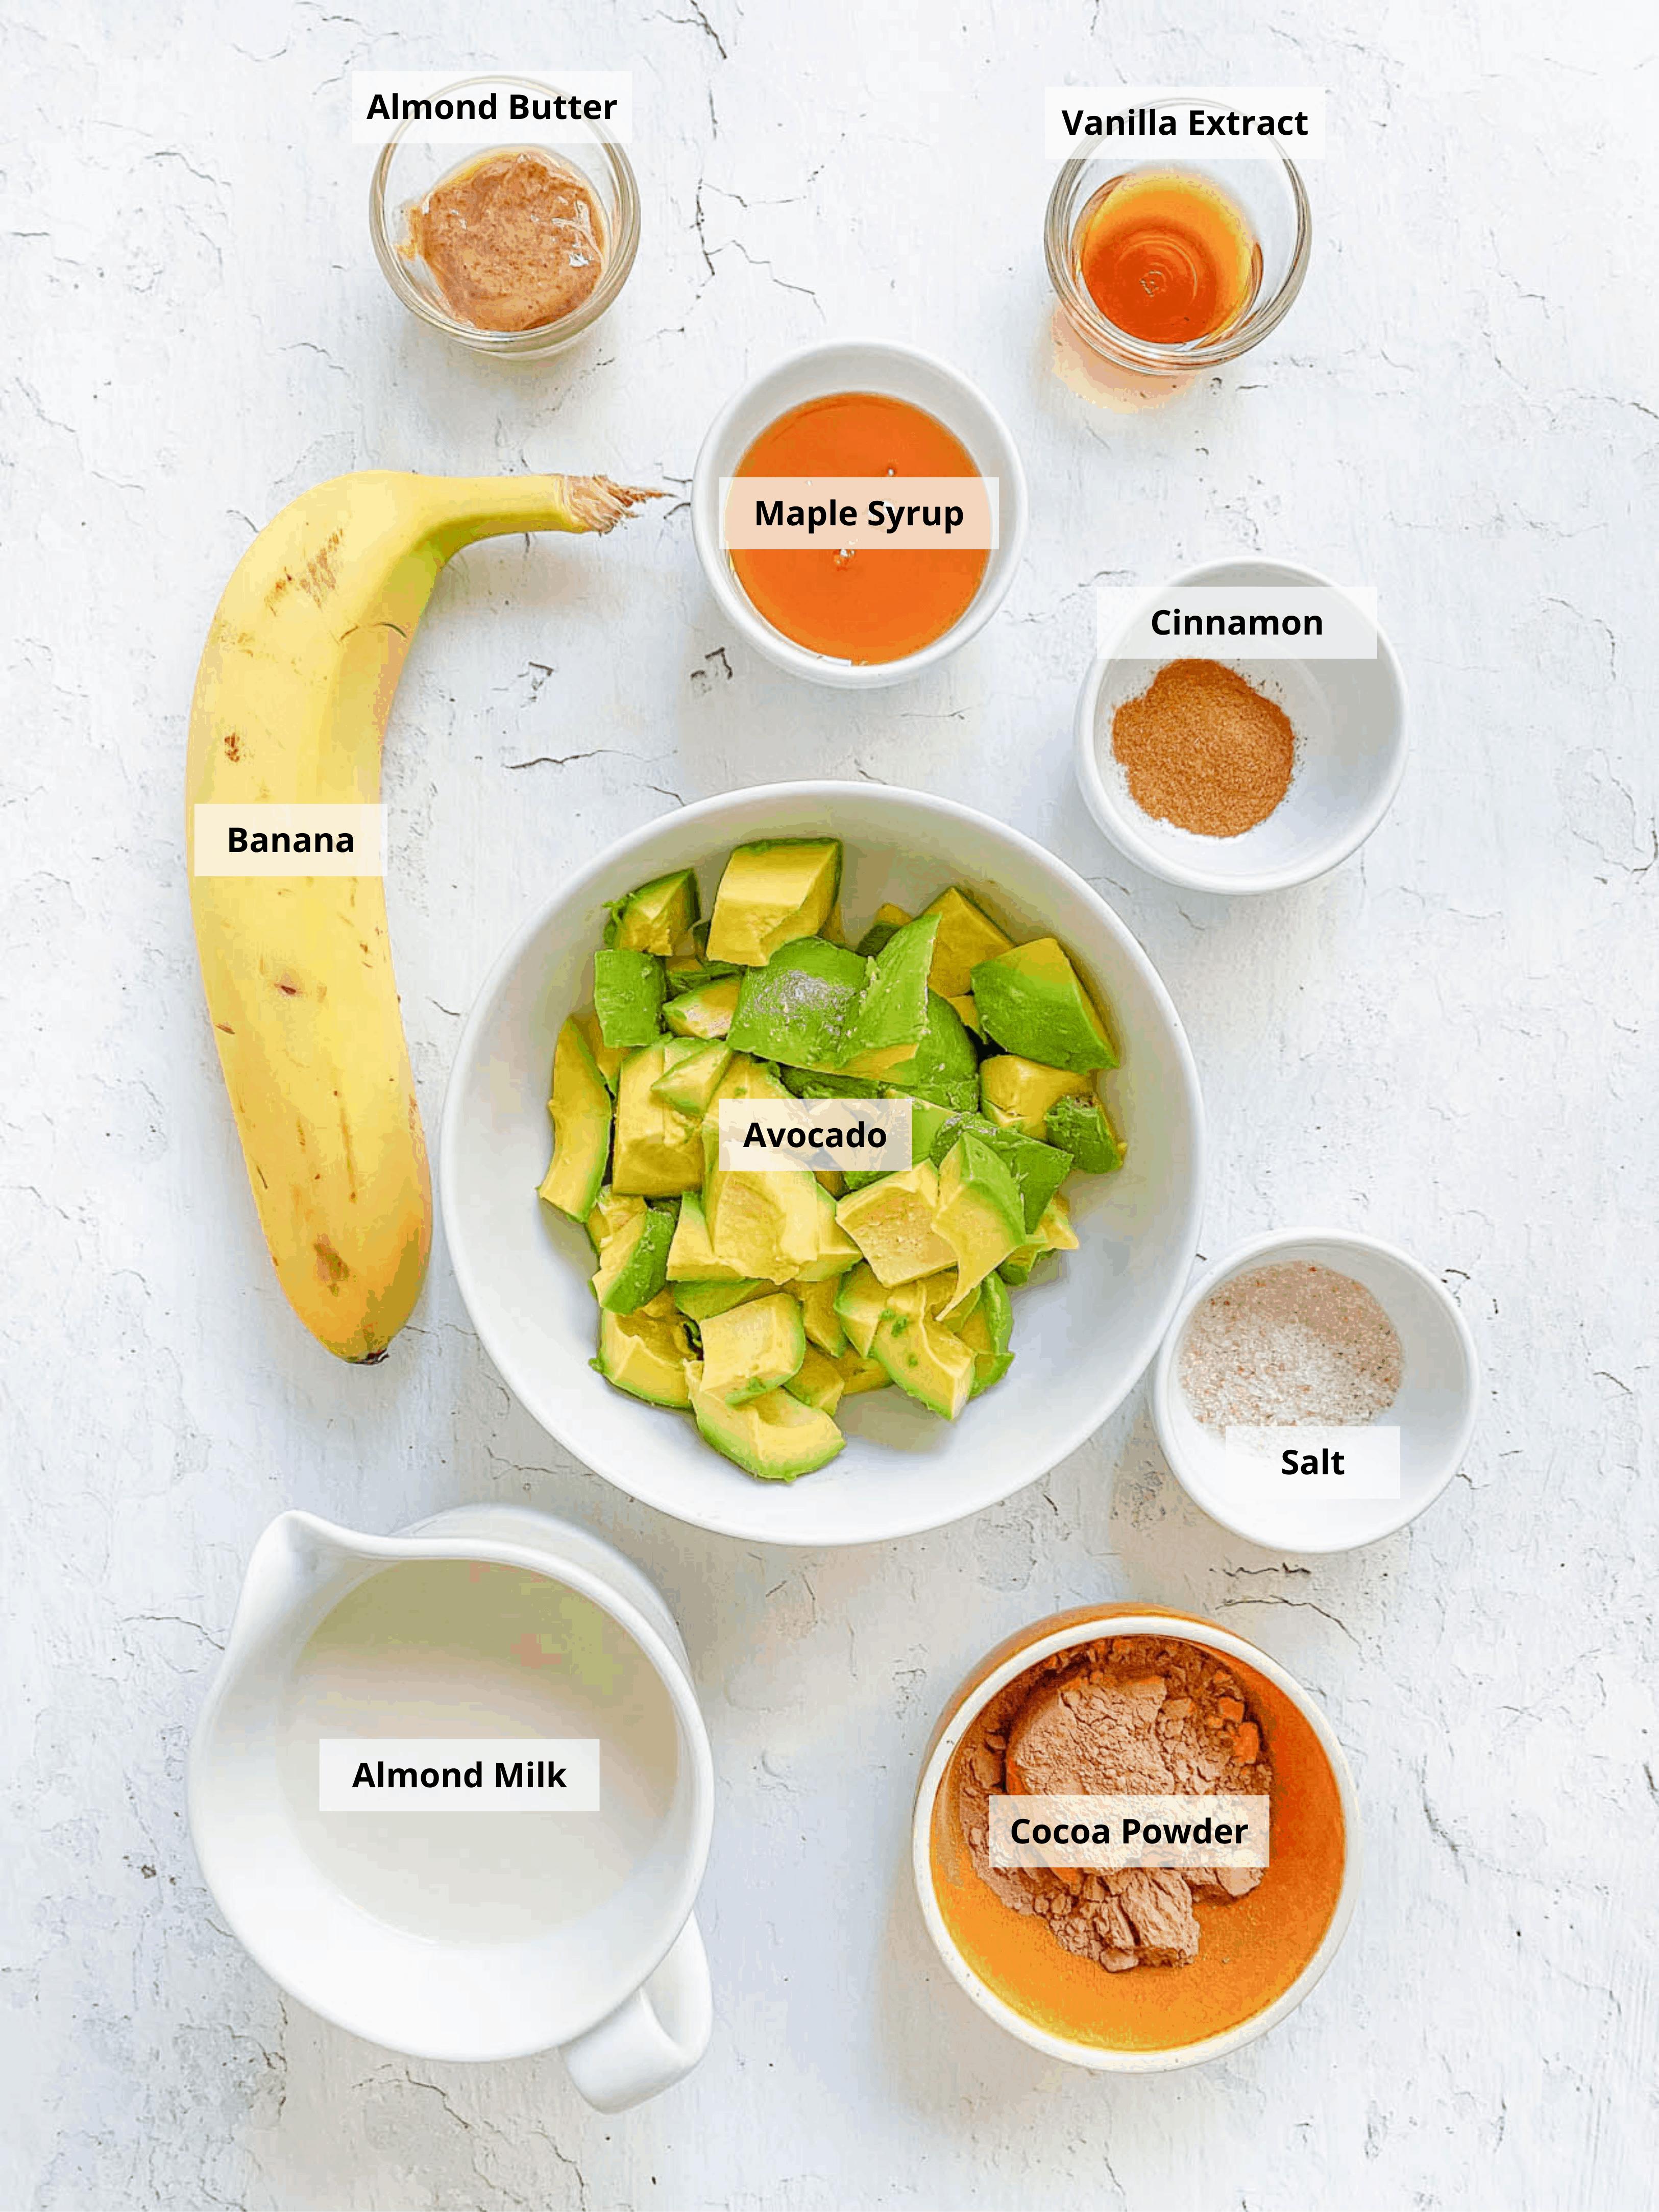 recipe ingredients - banana avocado cocoa powder almond milk maple syrup spices vanilla almond butter